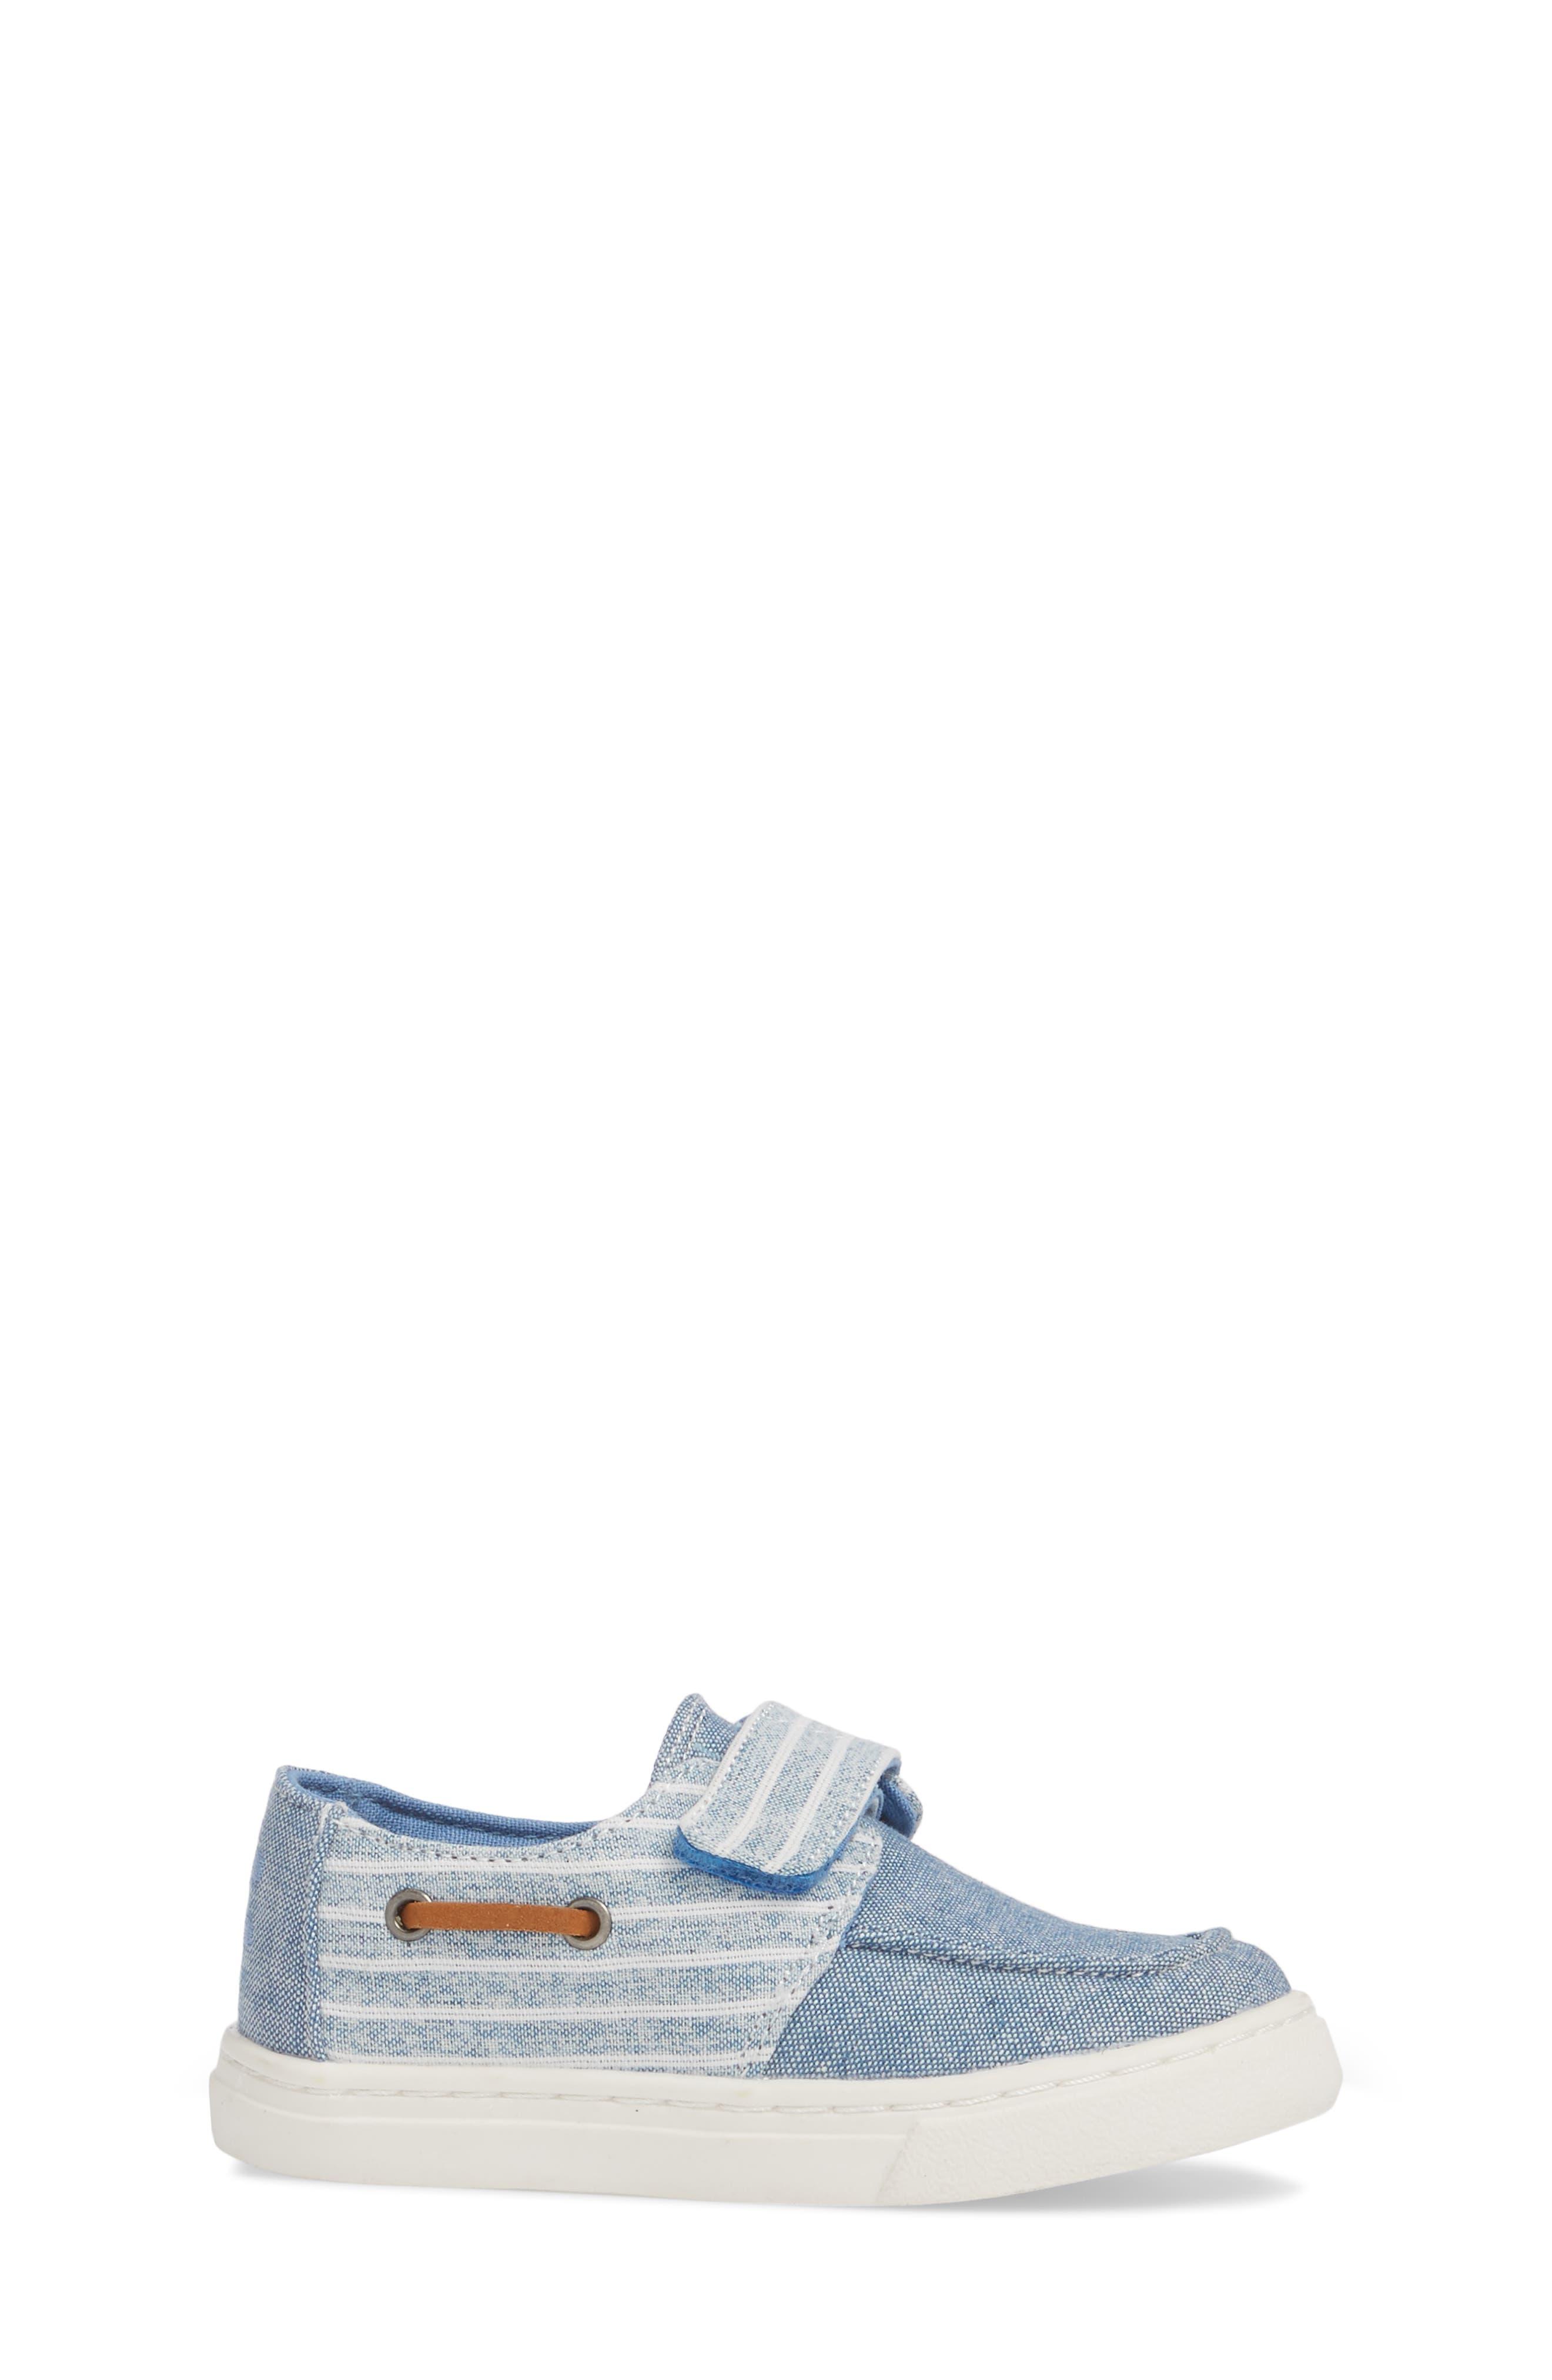 Culver Boat Shoe,                             Alternate thumbnail 3, color,                             BLUE CHAMBRAY/ STRIPE